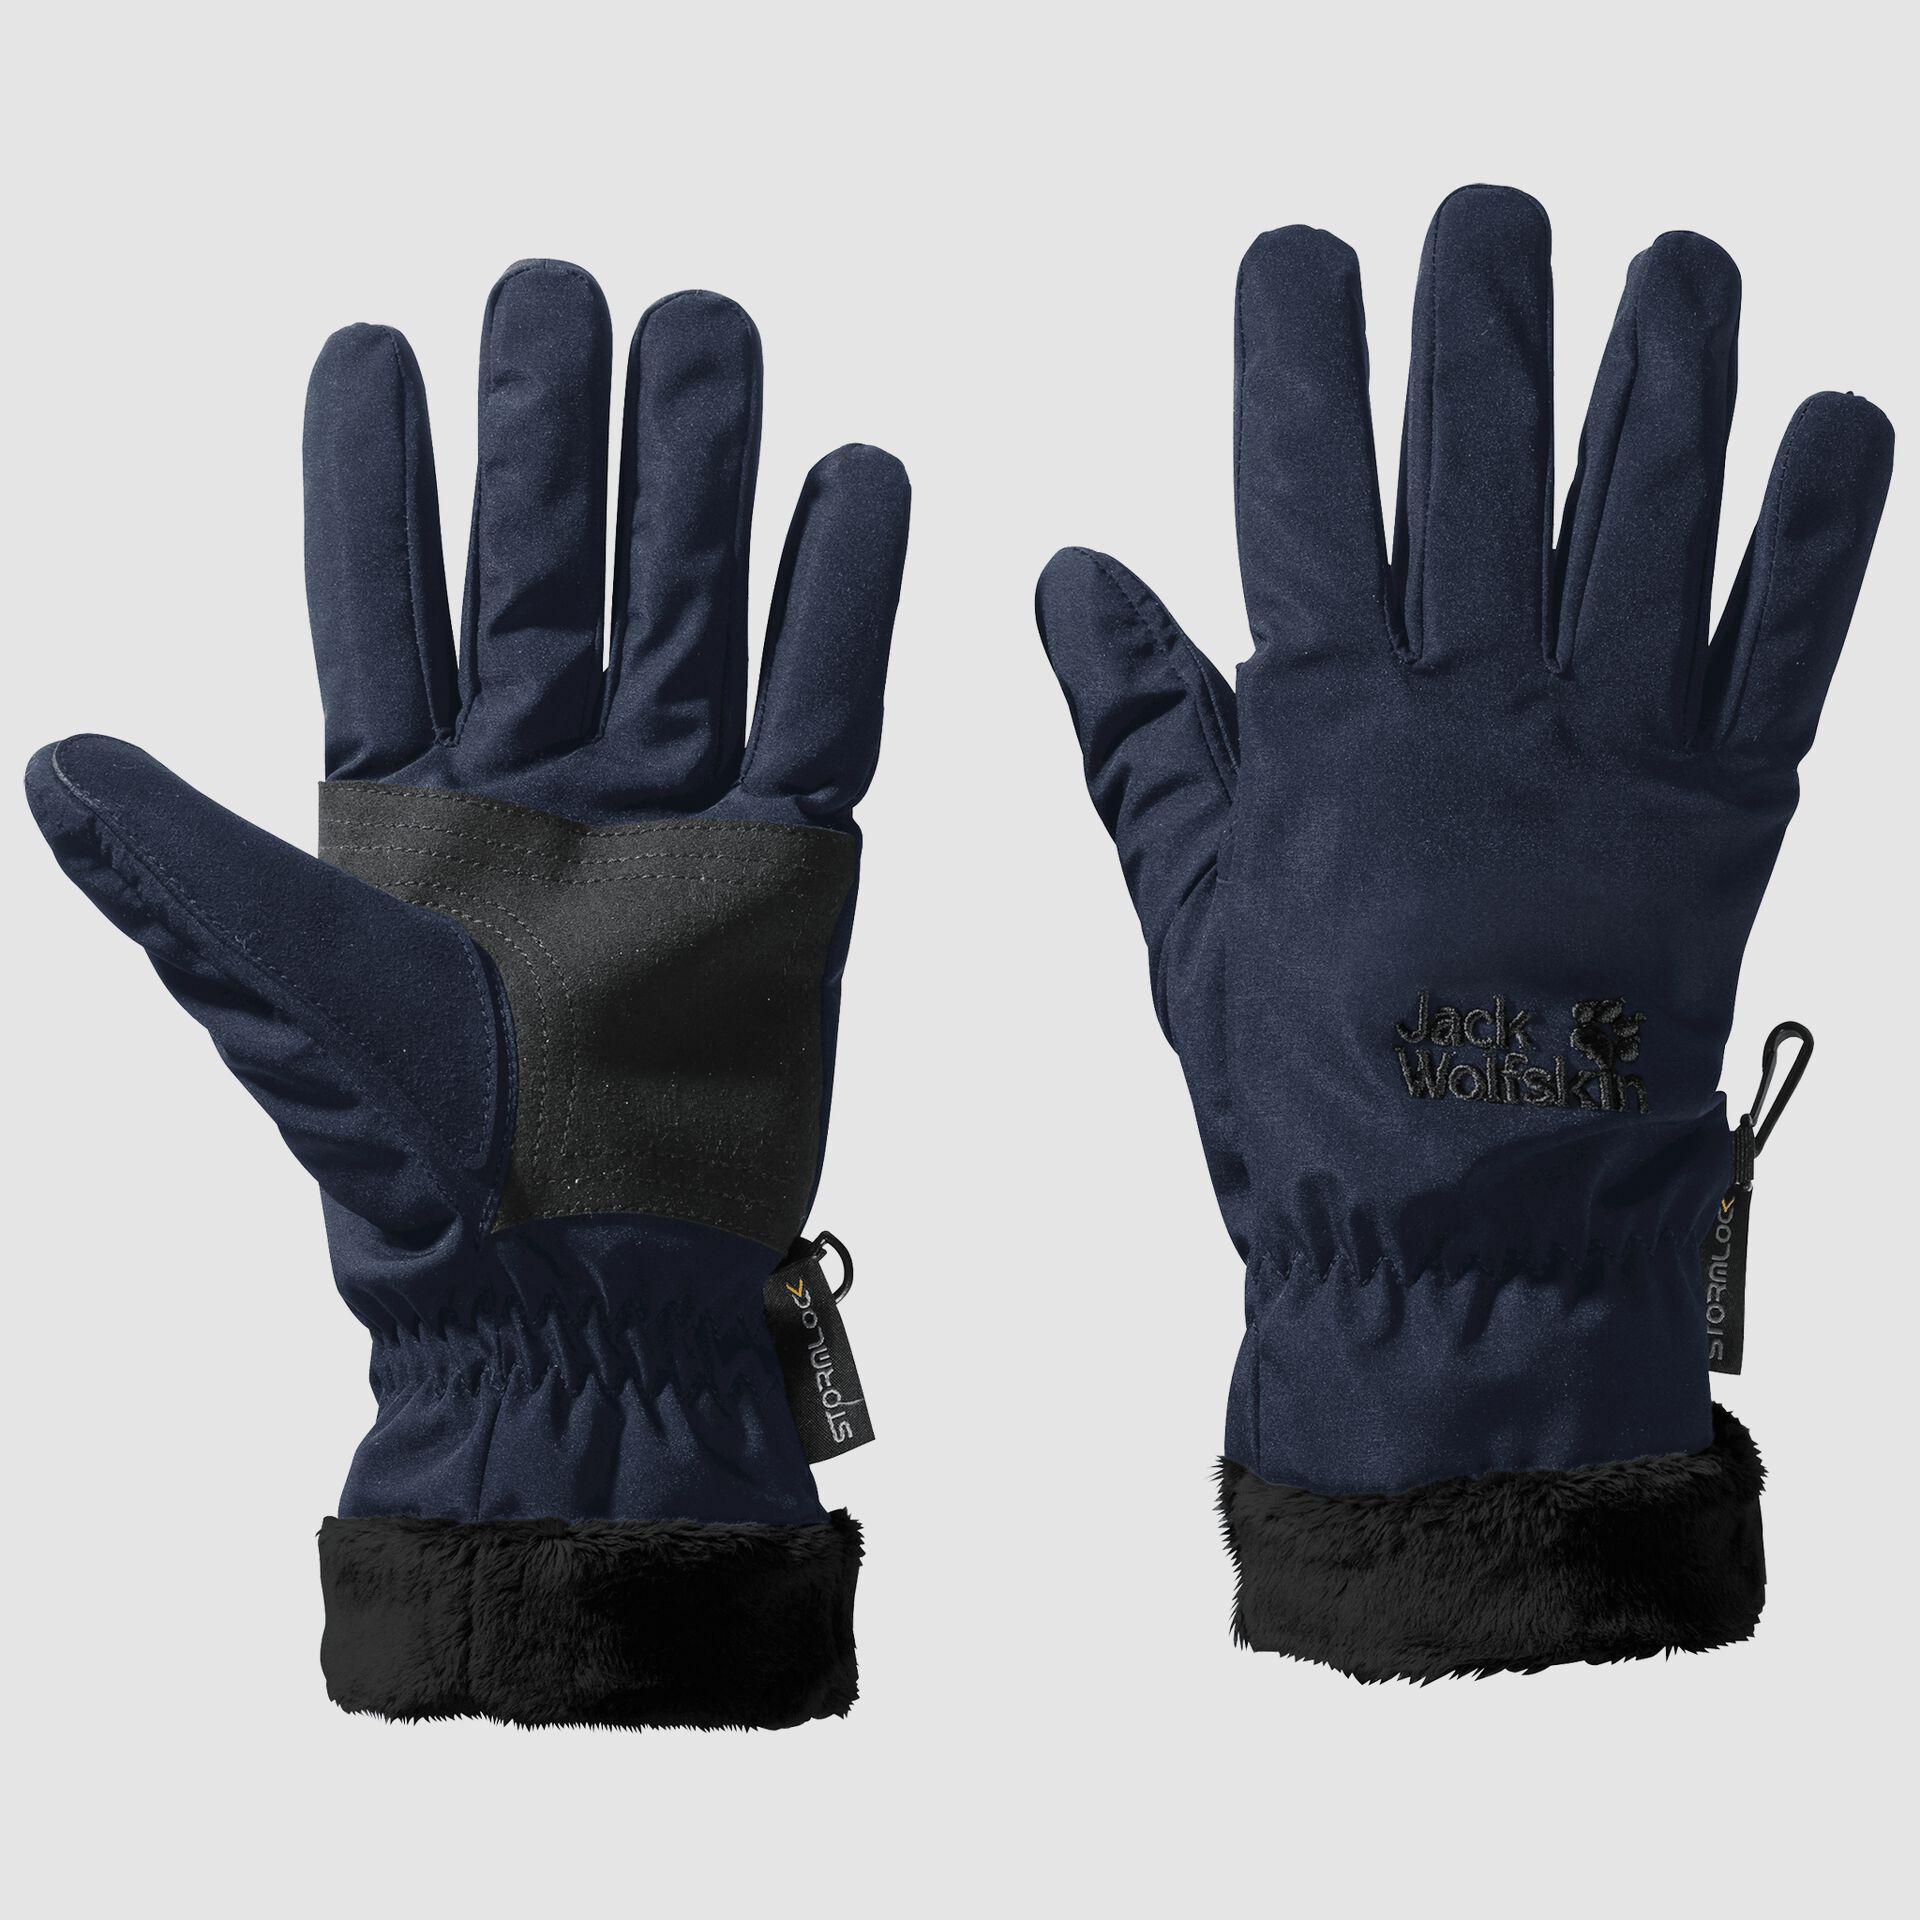 Jack Wolfskin Unisex Stormlock Highloft Glove Winter Glove Windproof